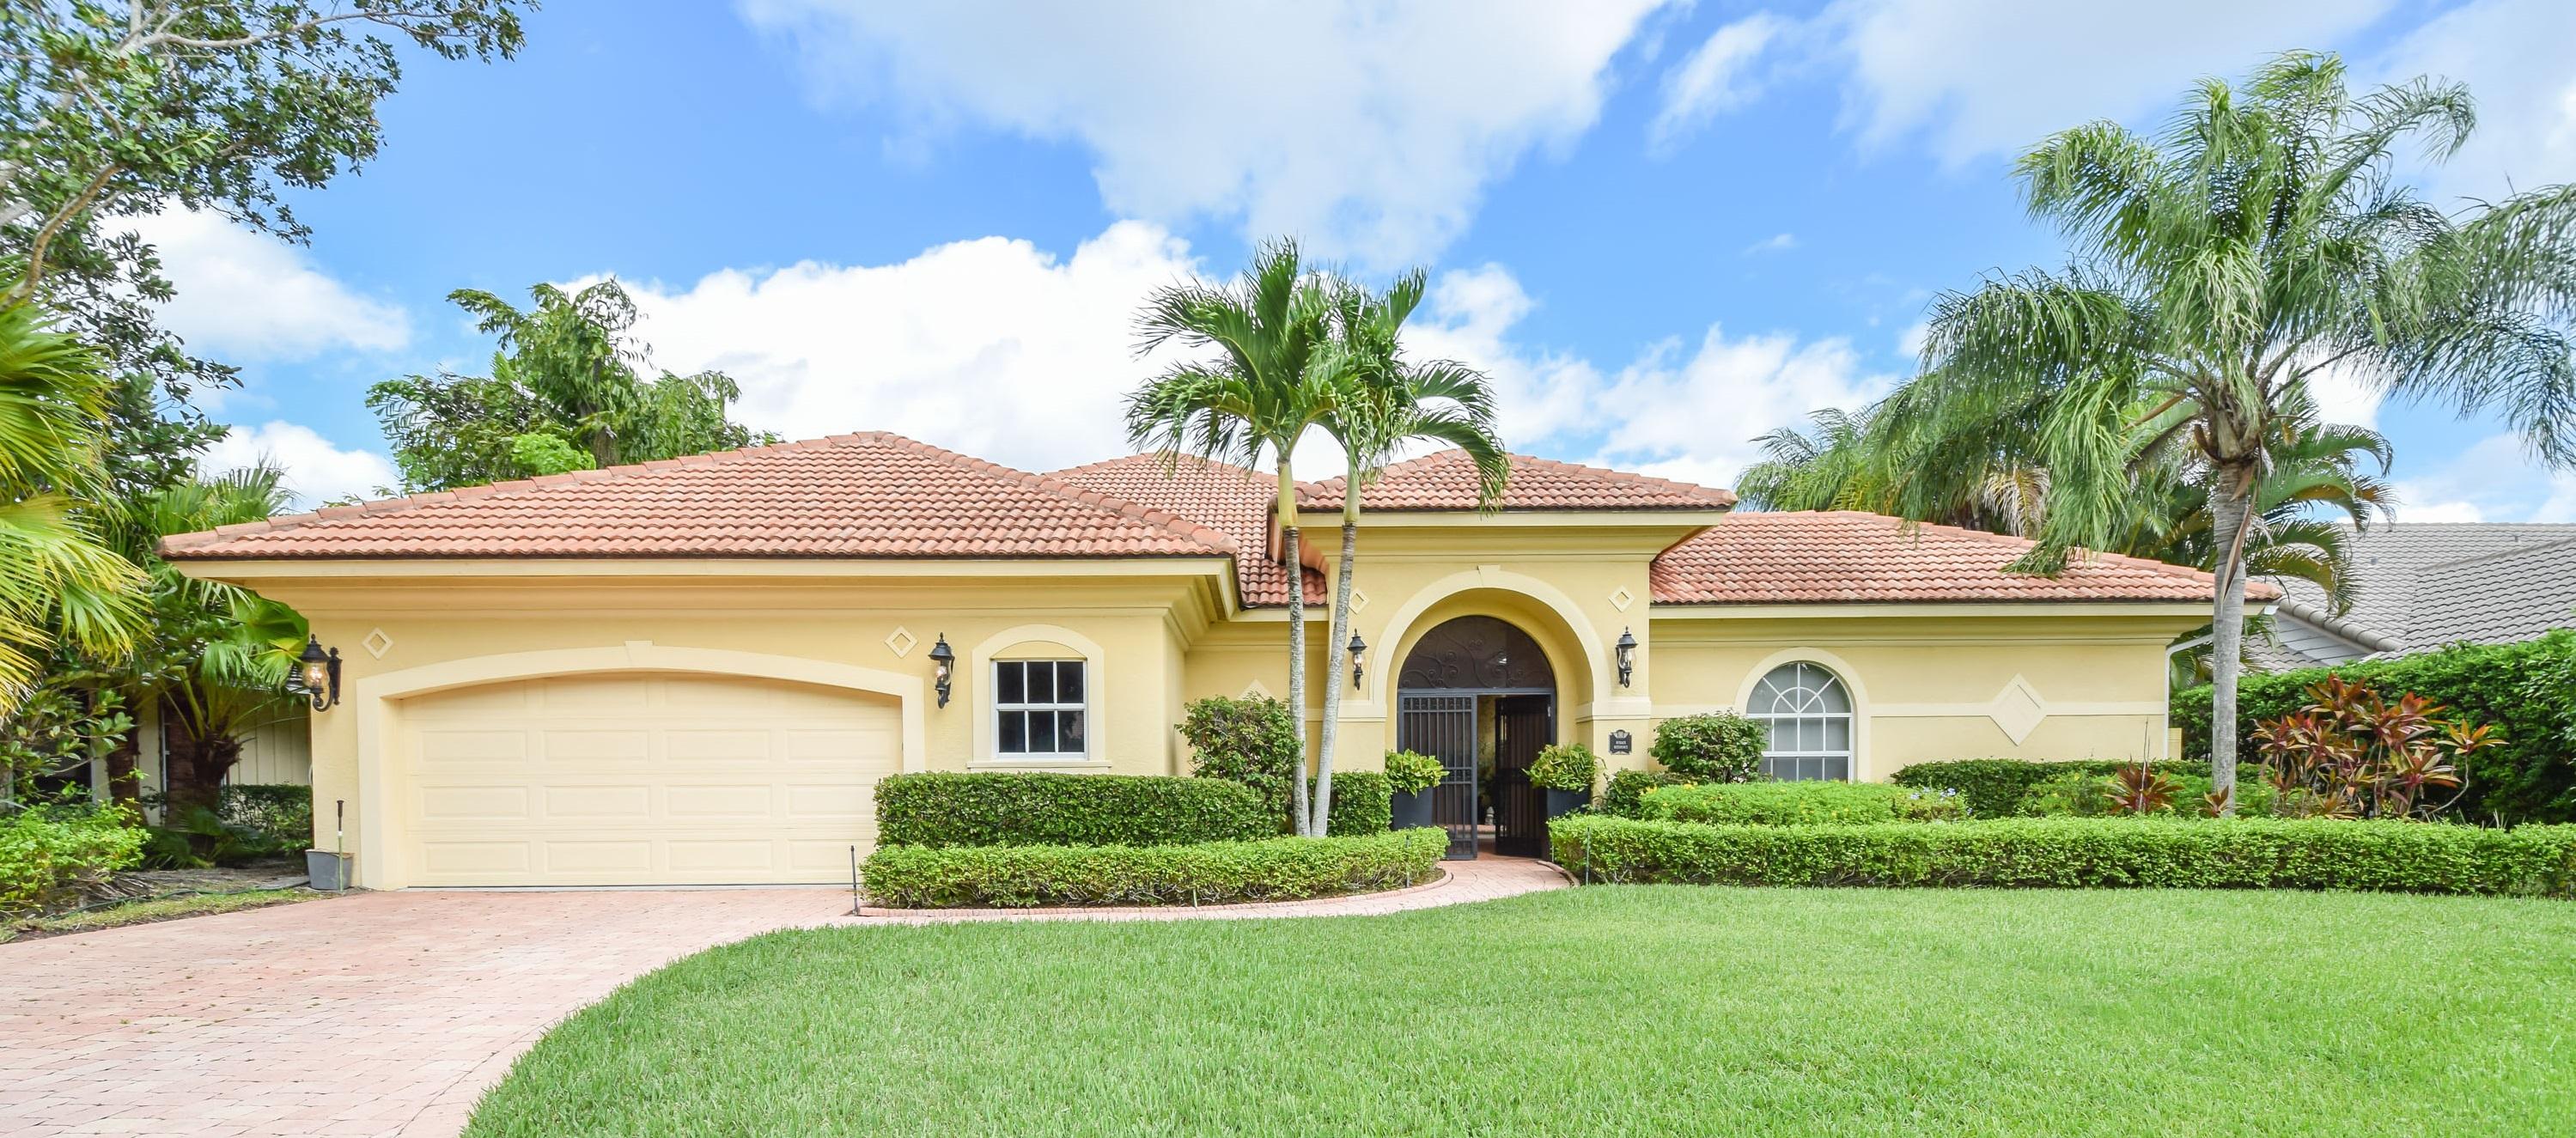 Homes For Sale Palm Beach Gardens